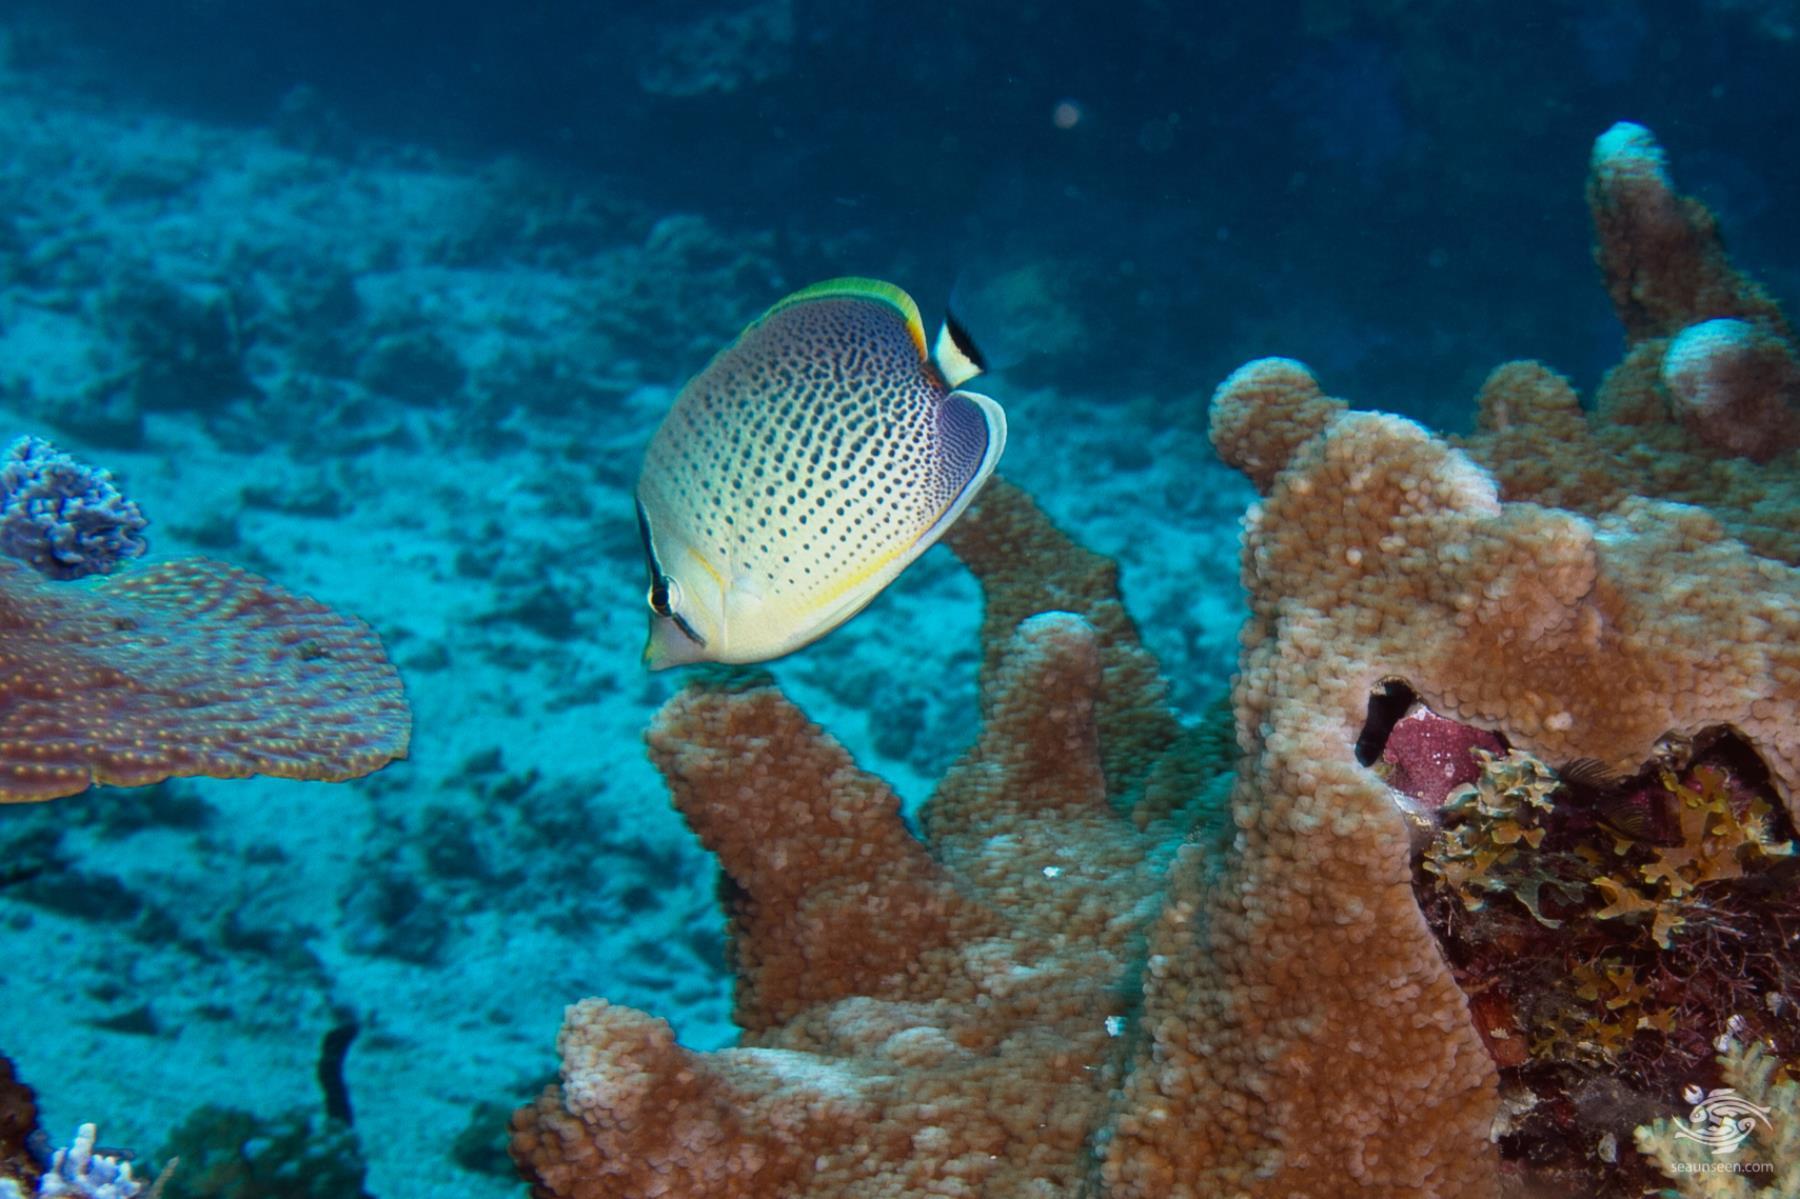 peppered butterflyfish, Chaetodon guttatissimus